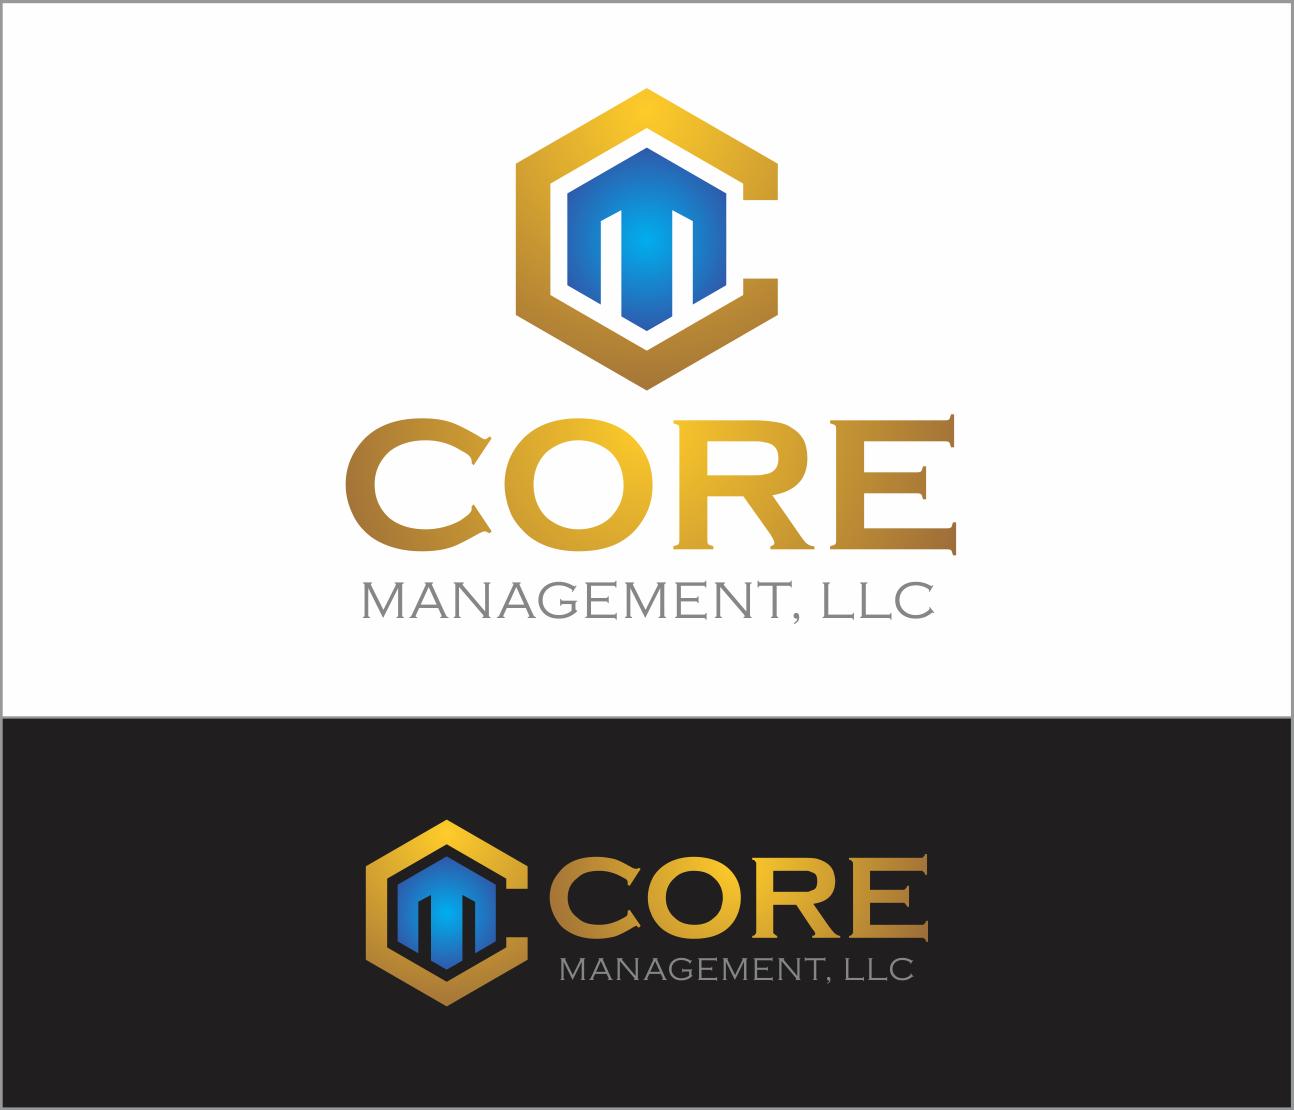 Logo Design by Armada Jamaluddin - Entry No. 165 in the Logo Design Contest Creative Logo Design for CORE Management, LLC.